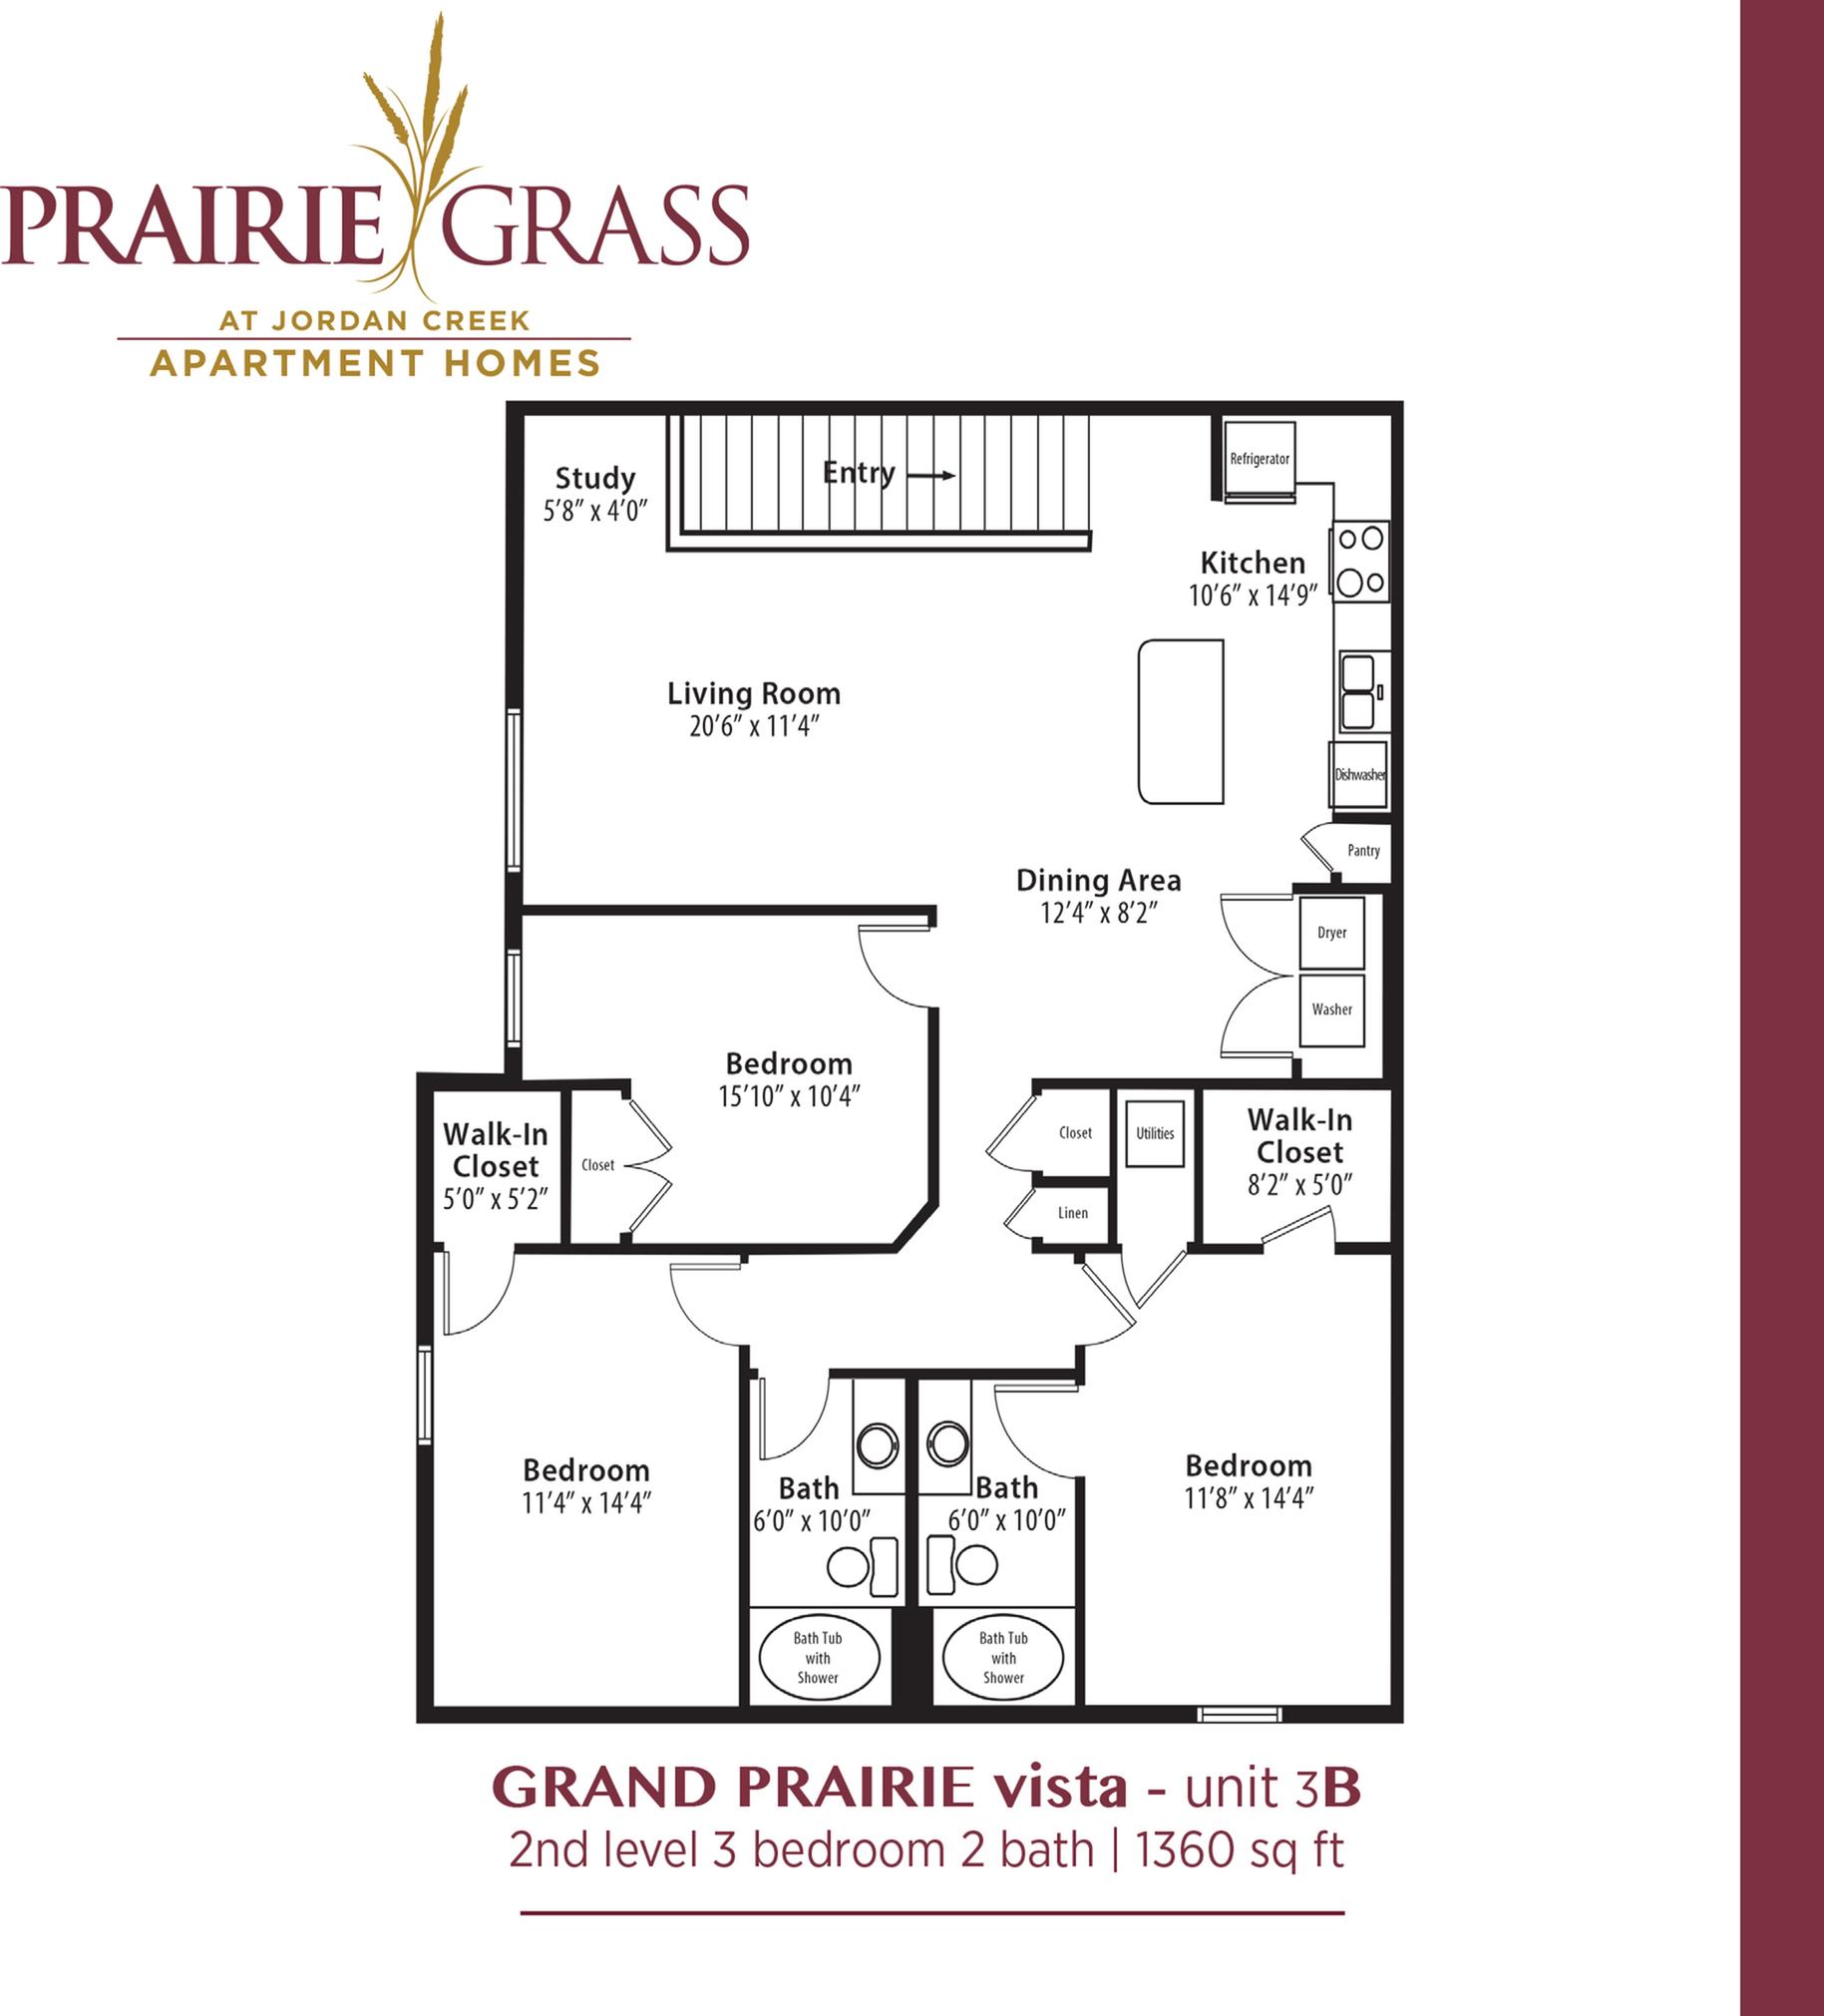 GrandPrairie Vista - Upper 3 Bedroom